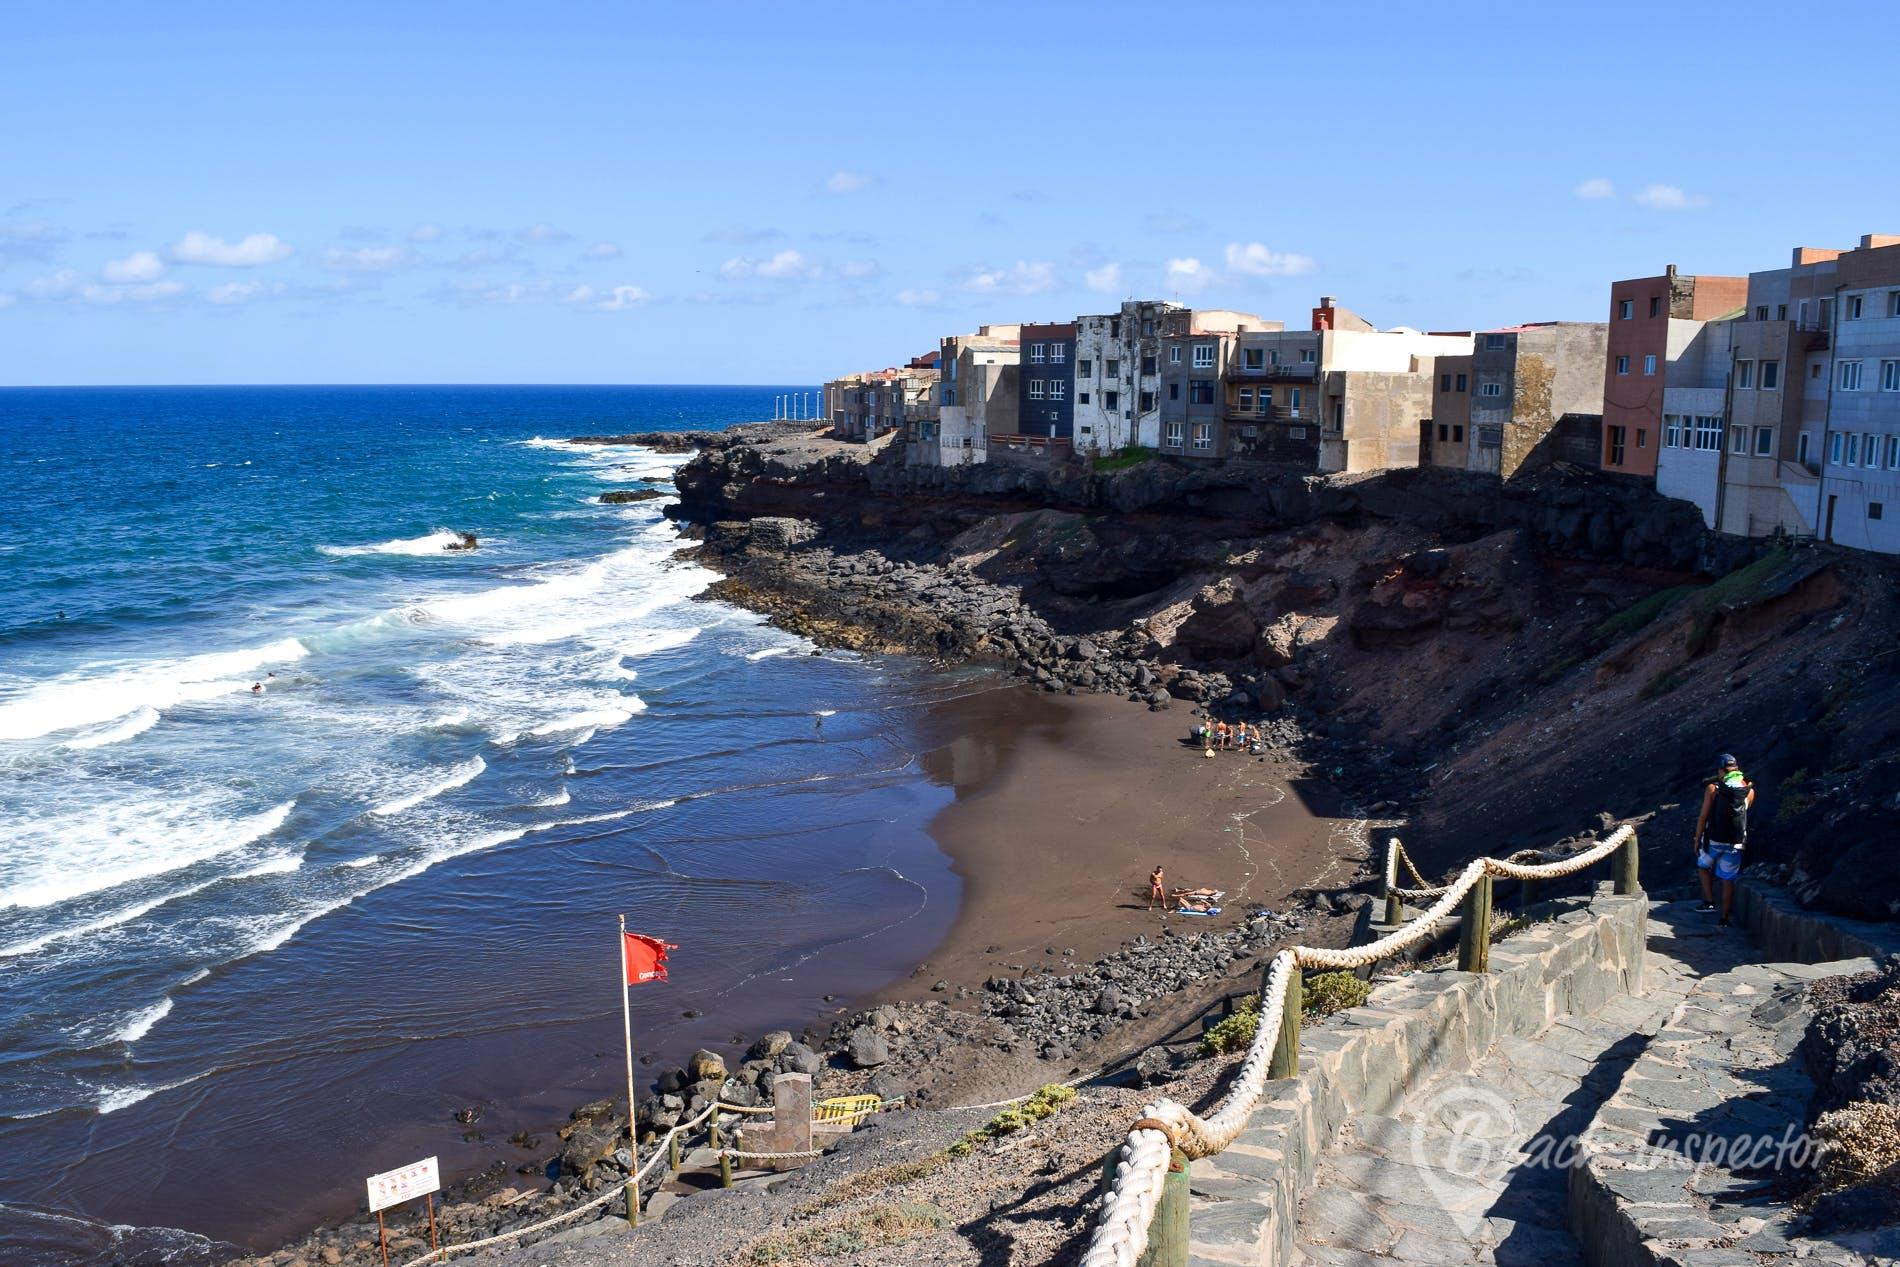 Beach Playa Palo Grande, Gran Canaria, Spain